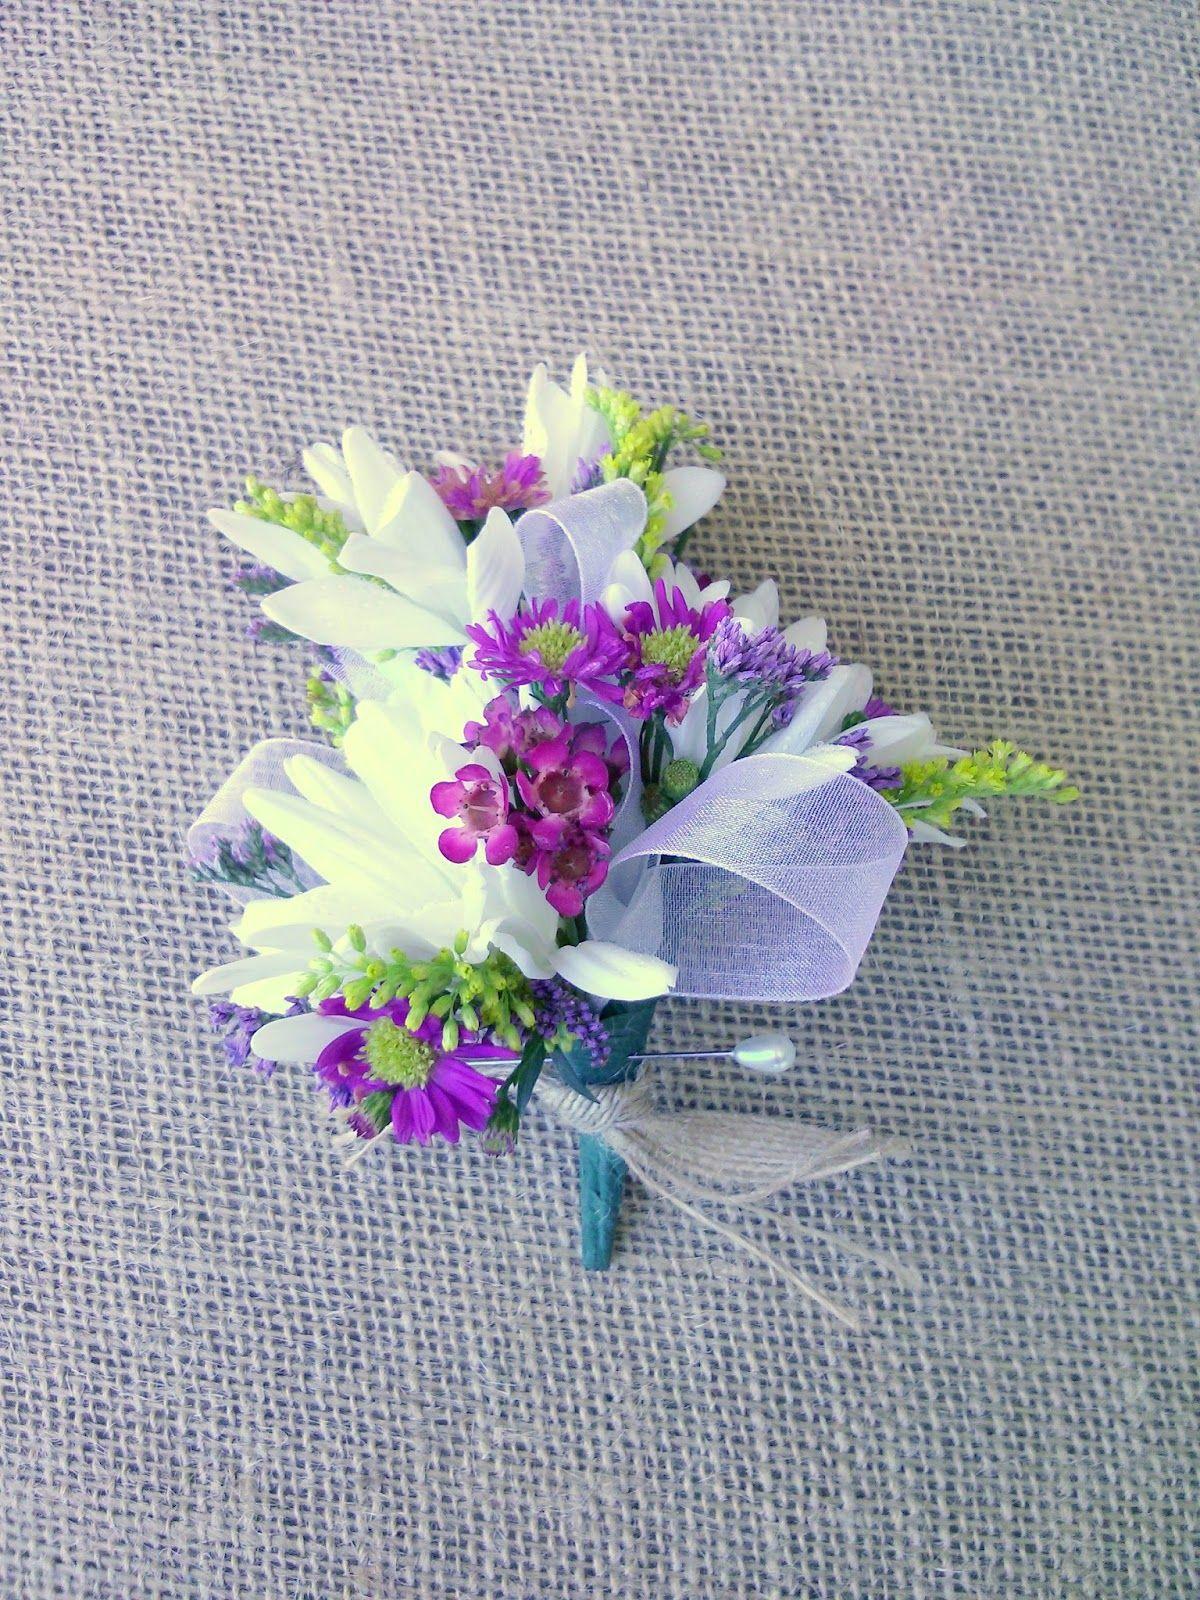 Celebration Flair Prom Flowers Wildflower Wedding Bridal Flowers